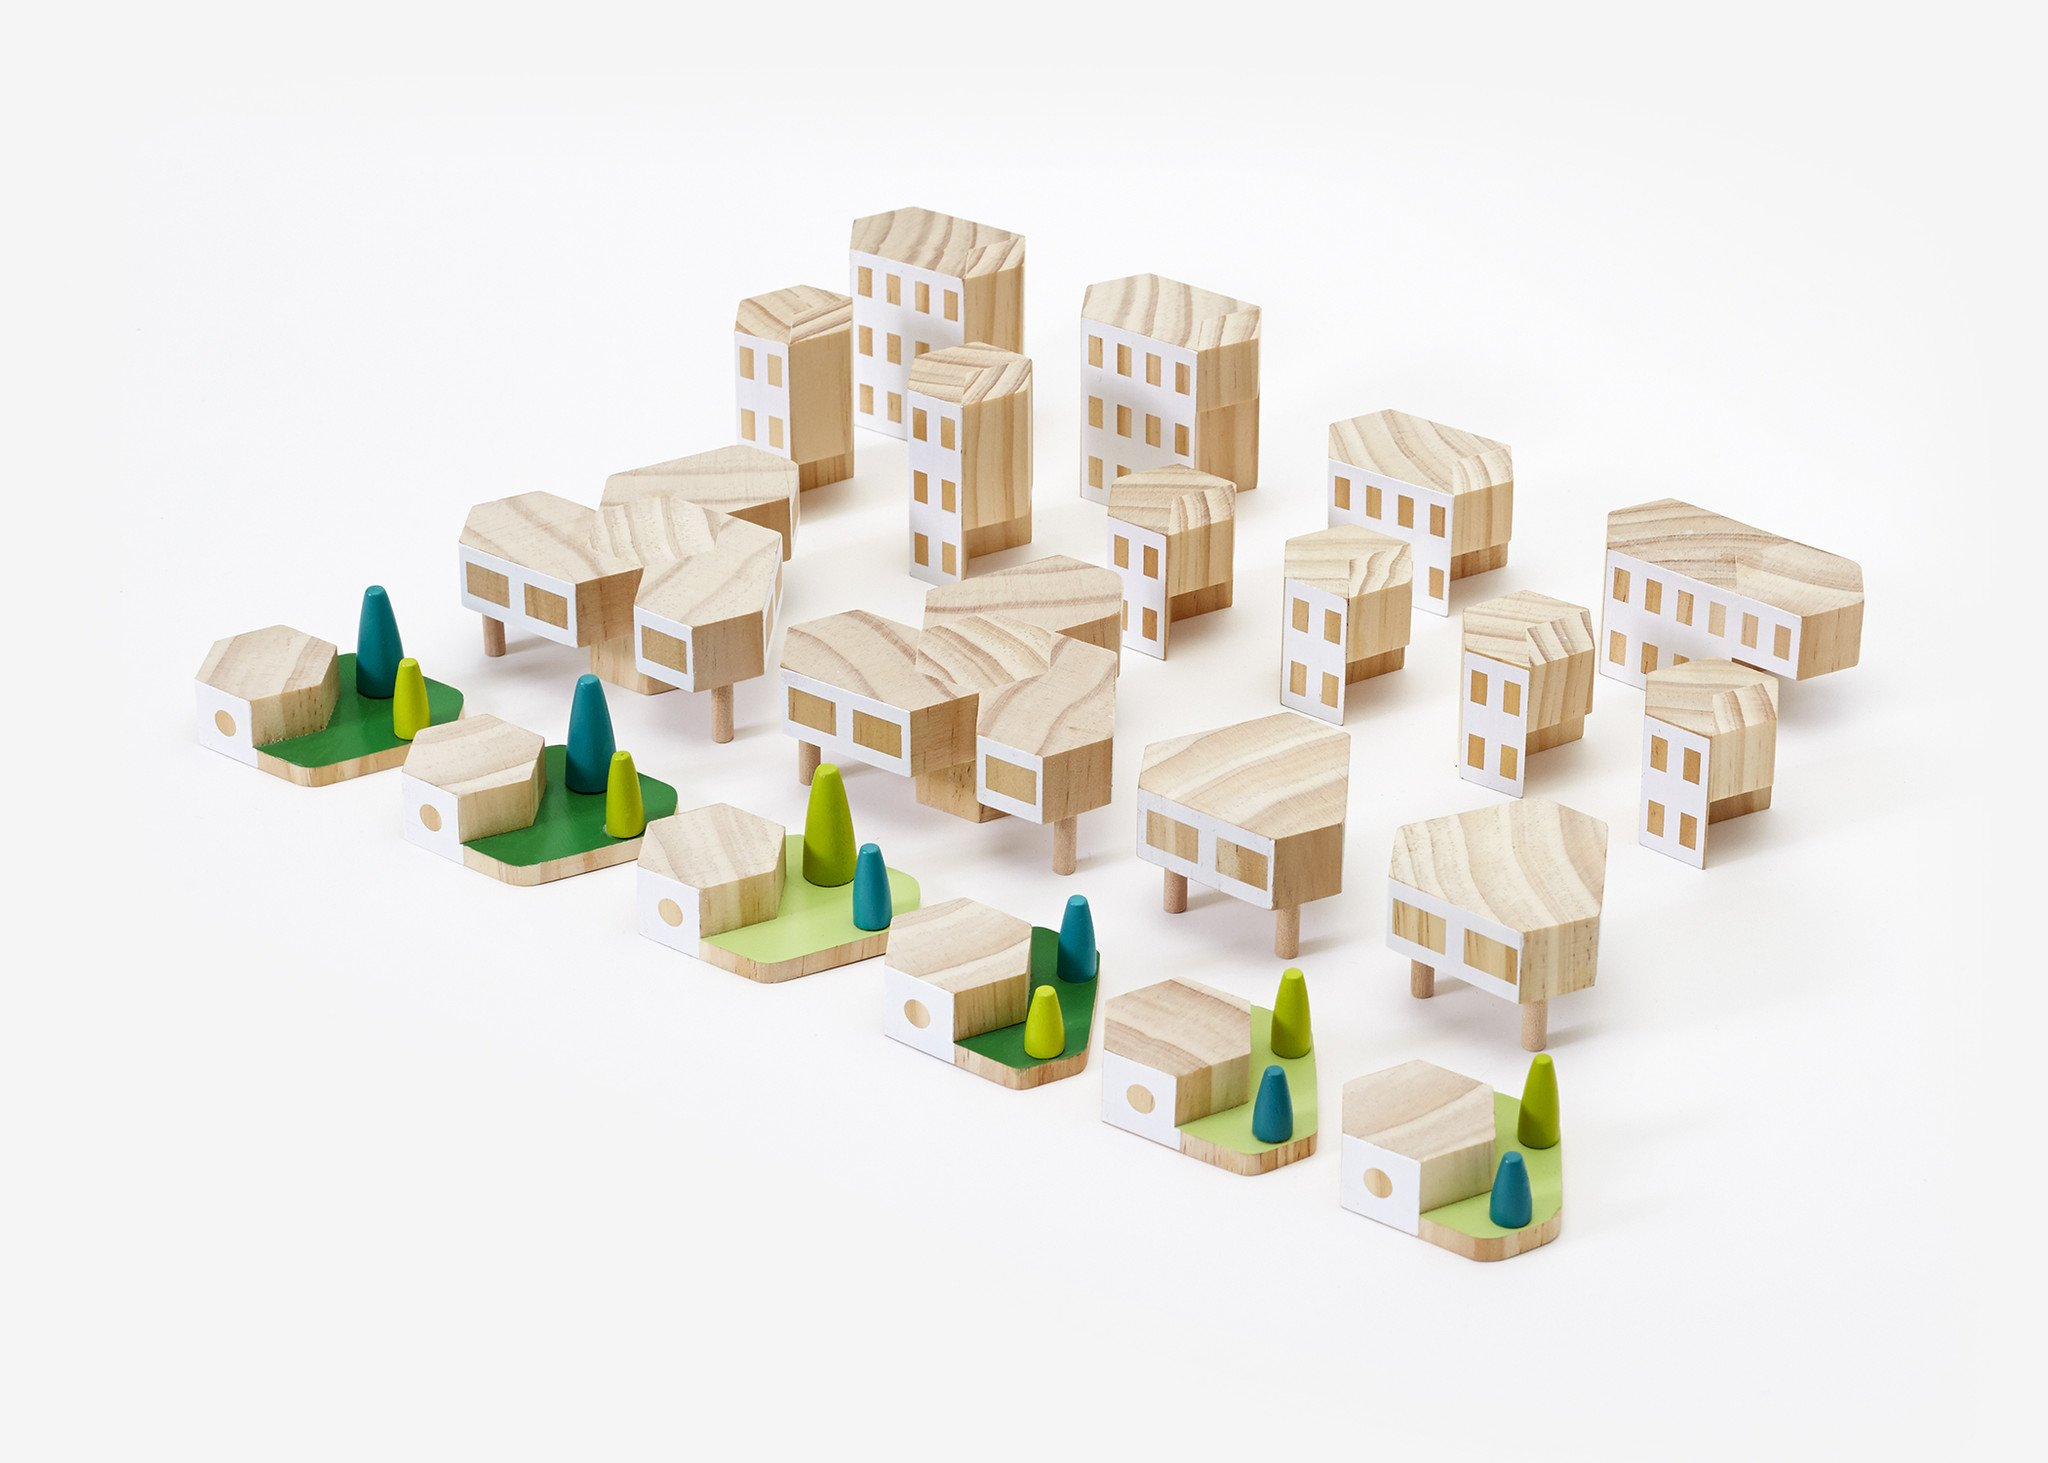 Blockitecture Garden City Mega Set Wood Toys Design Architecture